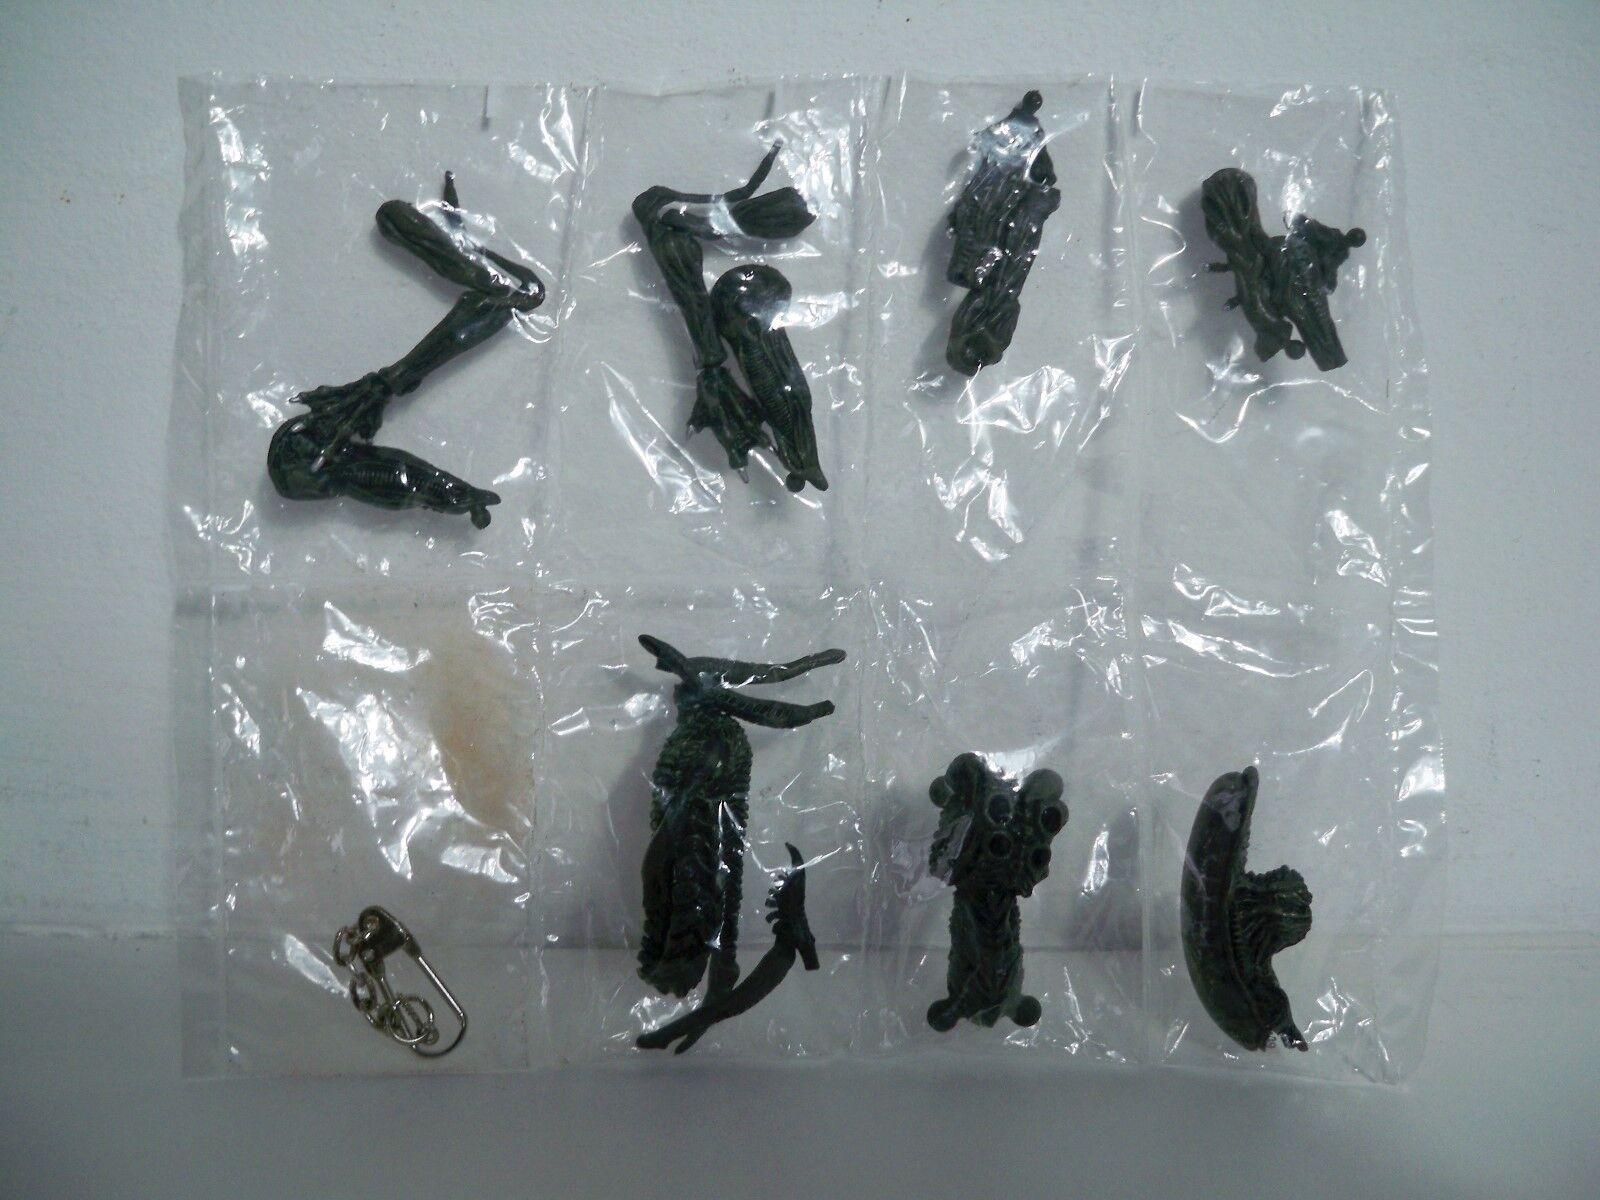 K160481 Alien Vs. Projoator Snap Kit serie 2 Figura De Alien Bolsa Sellada HOT TOYS 2005